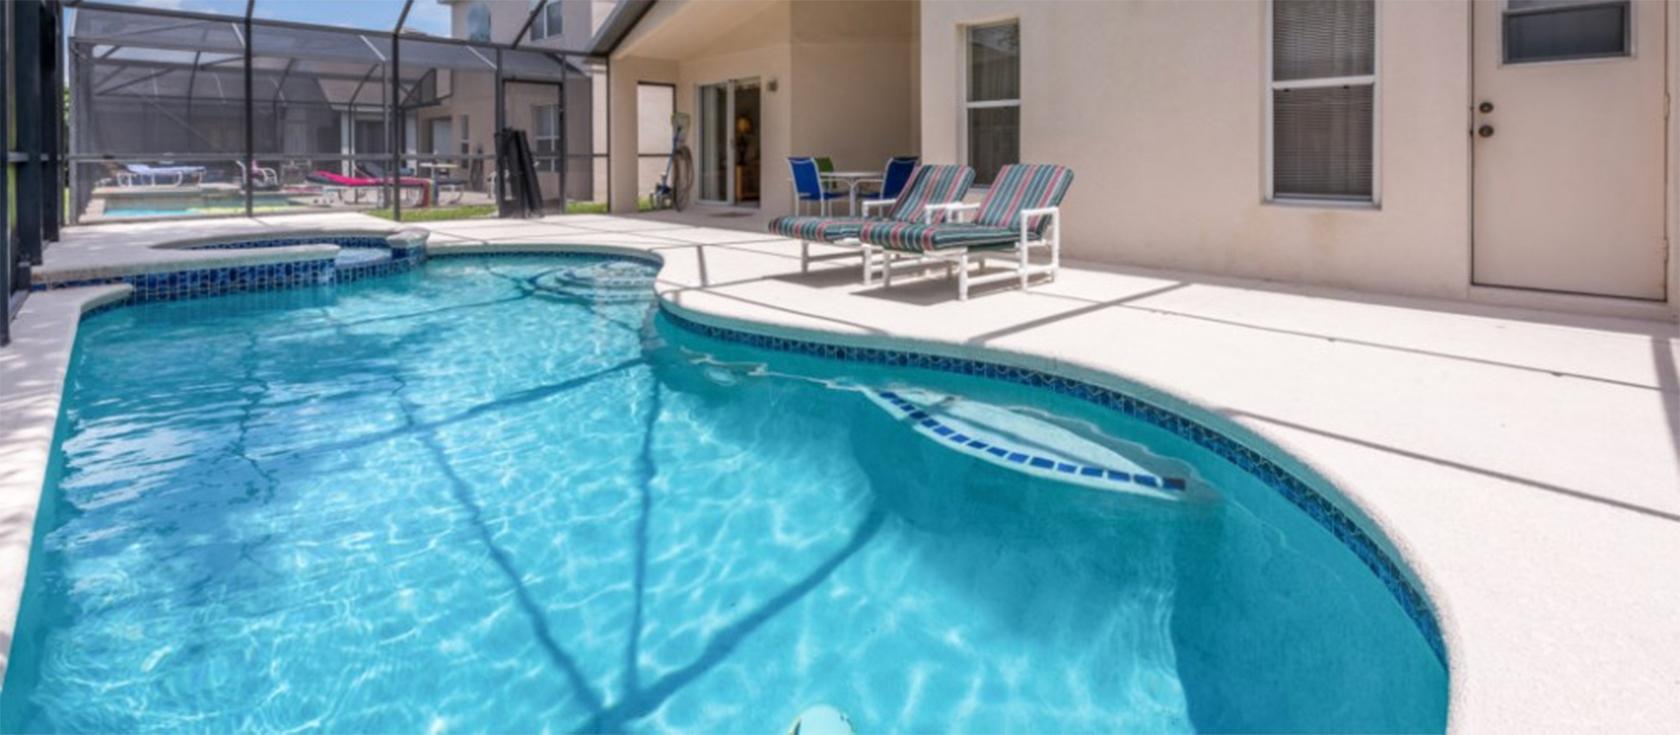 Emerald Island Resort 25, Kissimmee